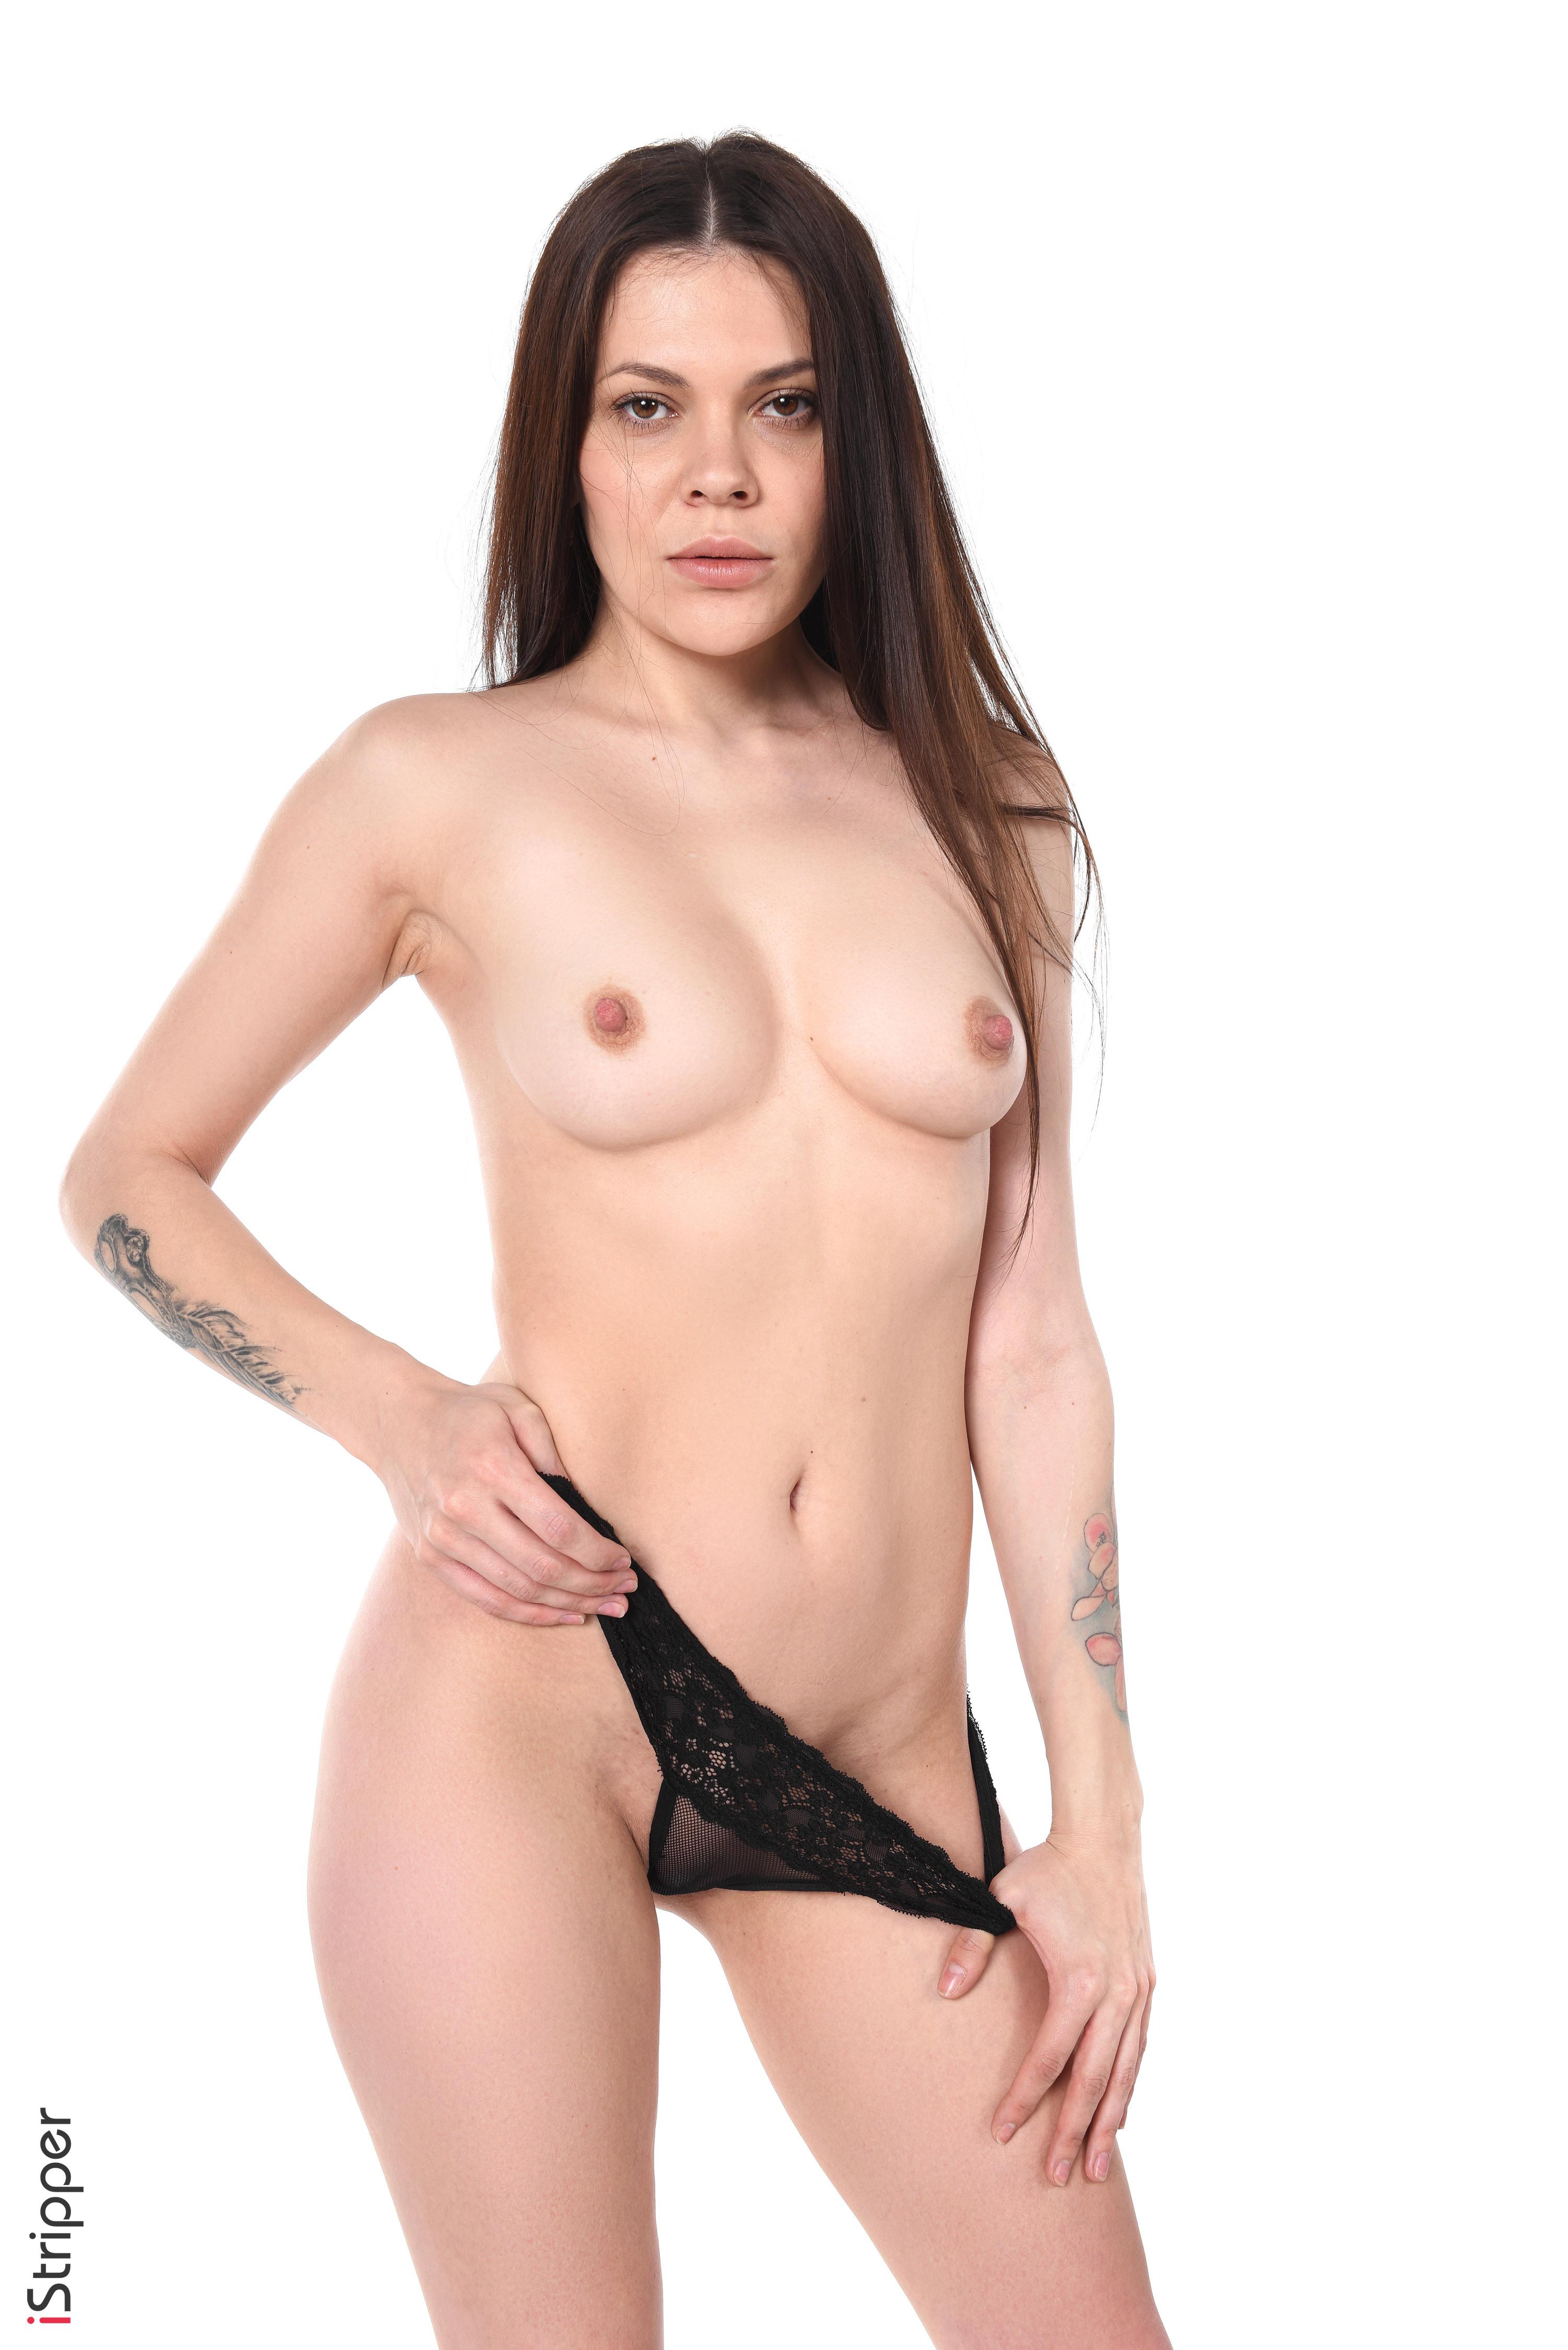 janessa brazil sexy dress striptease -site:customs4u.com